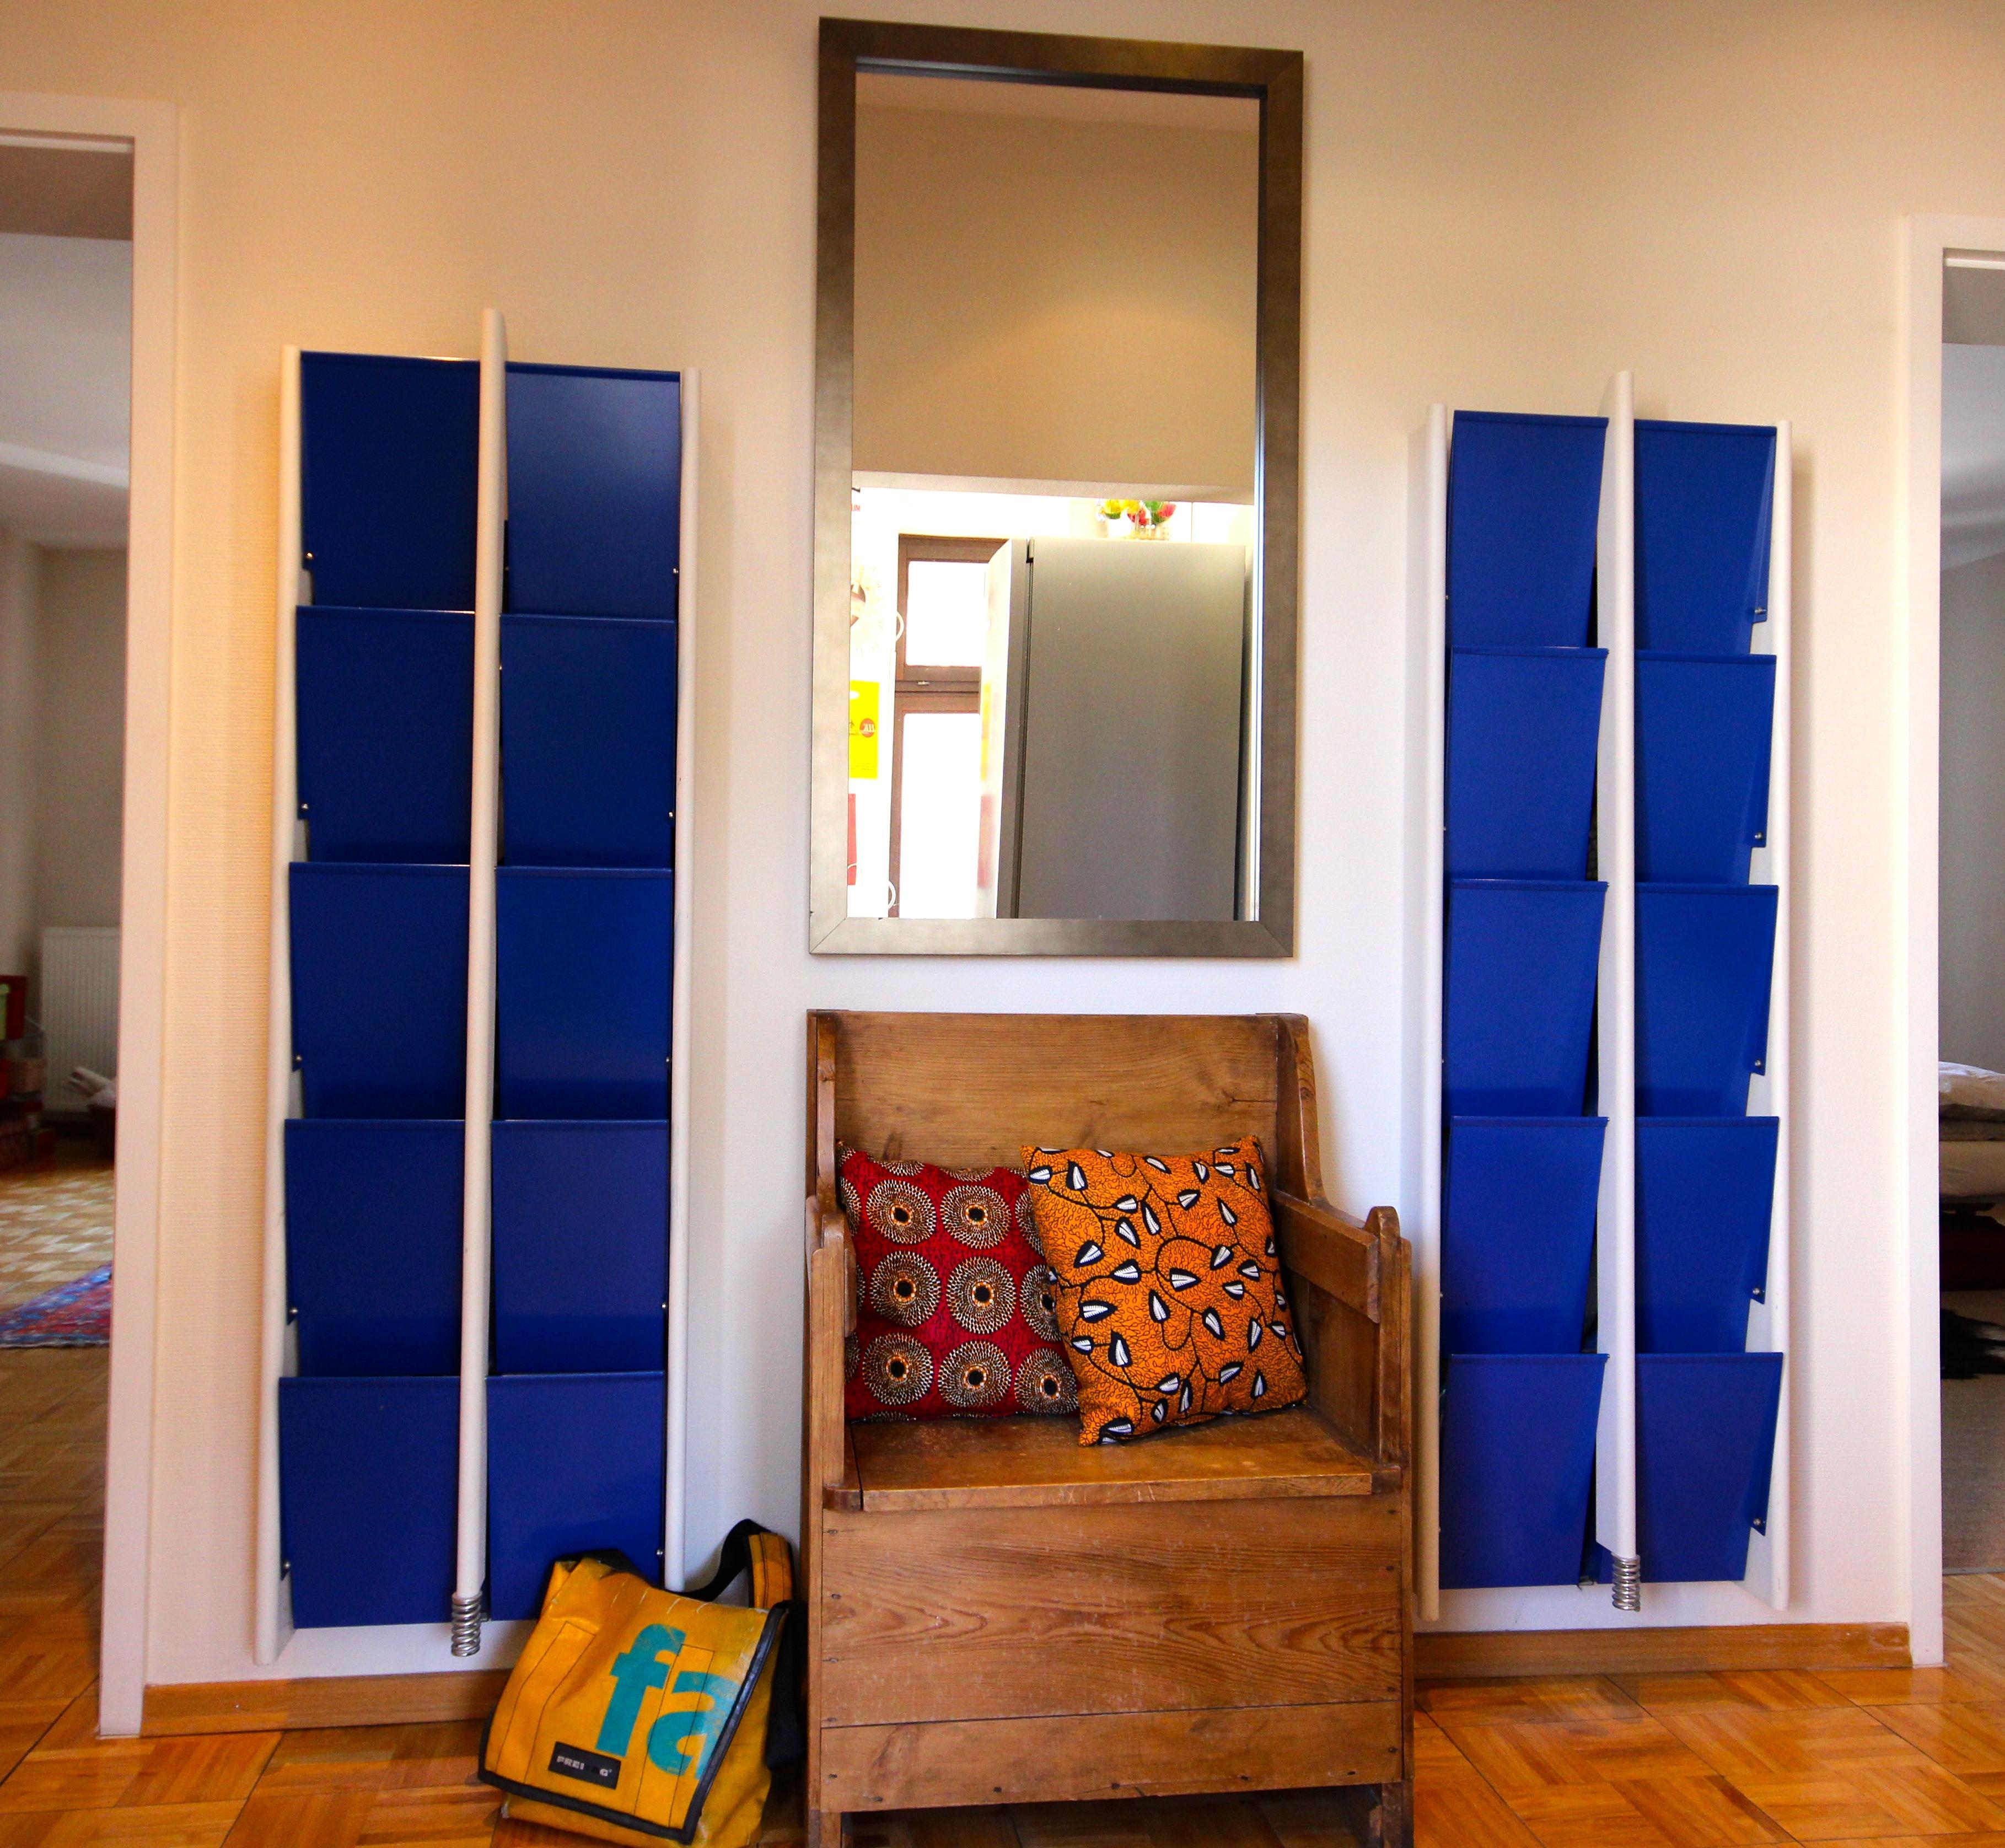 sch ne alte holzbank im flur kissen wandspiegel h. Black Bedroom Furniture Sets. Home Design Ideas